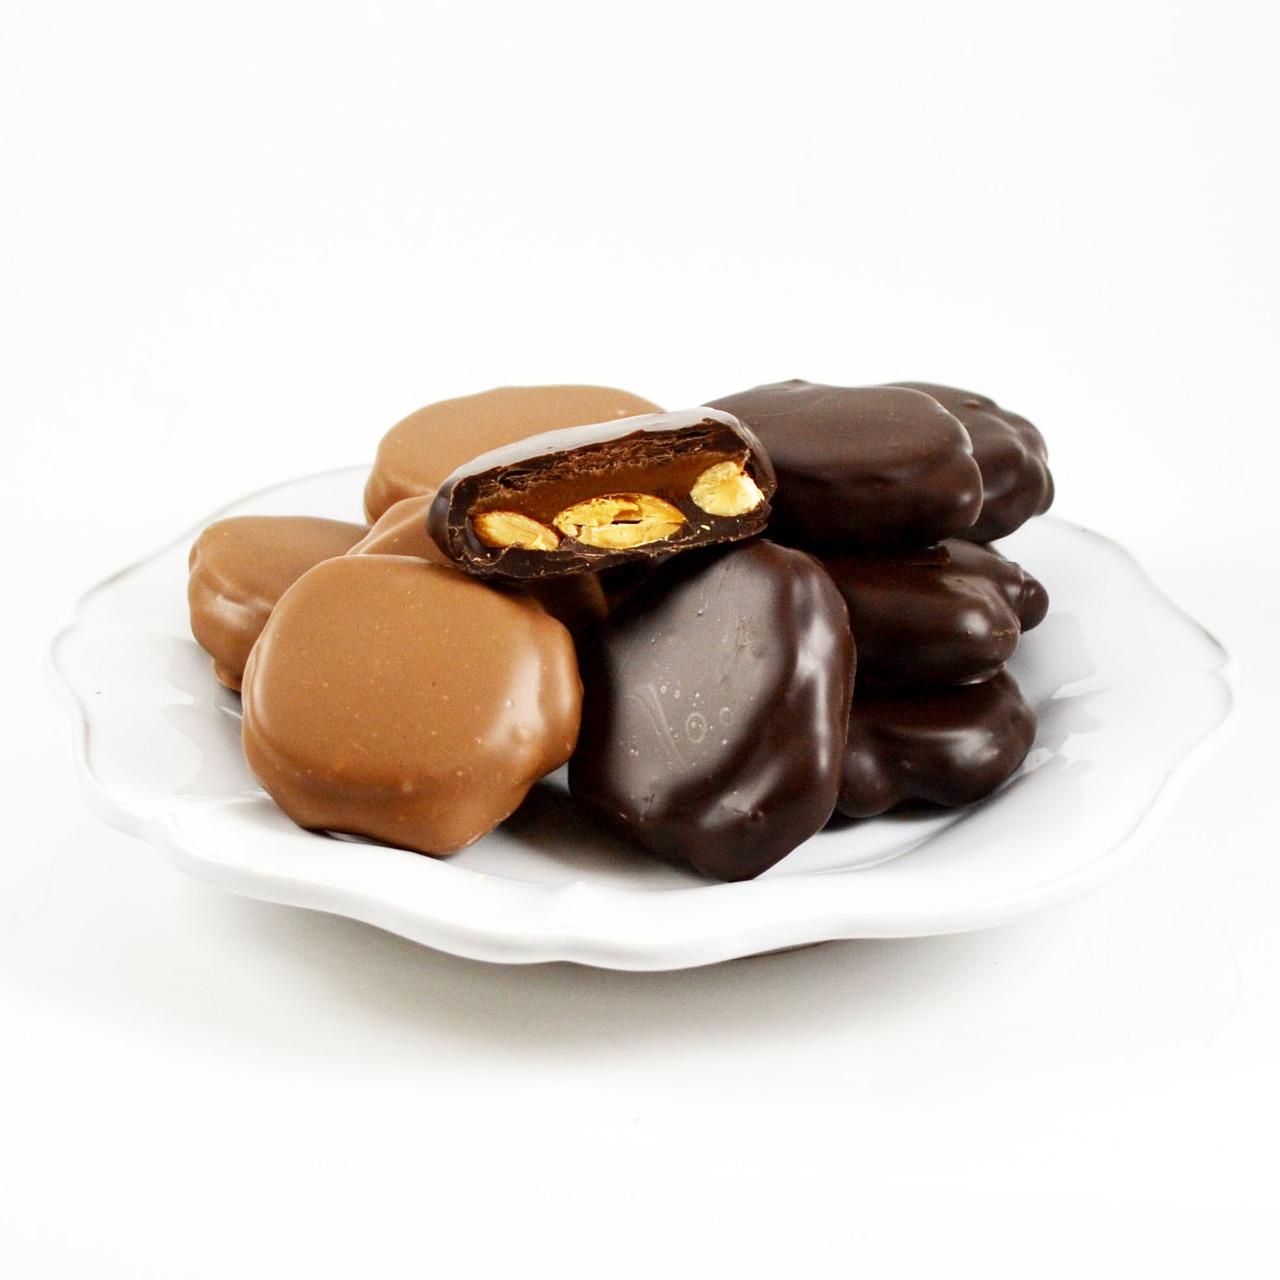 Almond Turtles - The Chocolatier